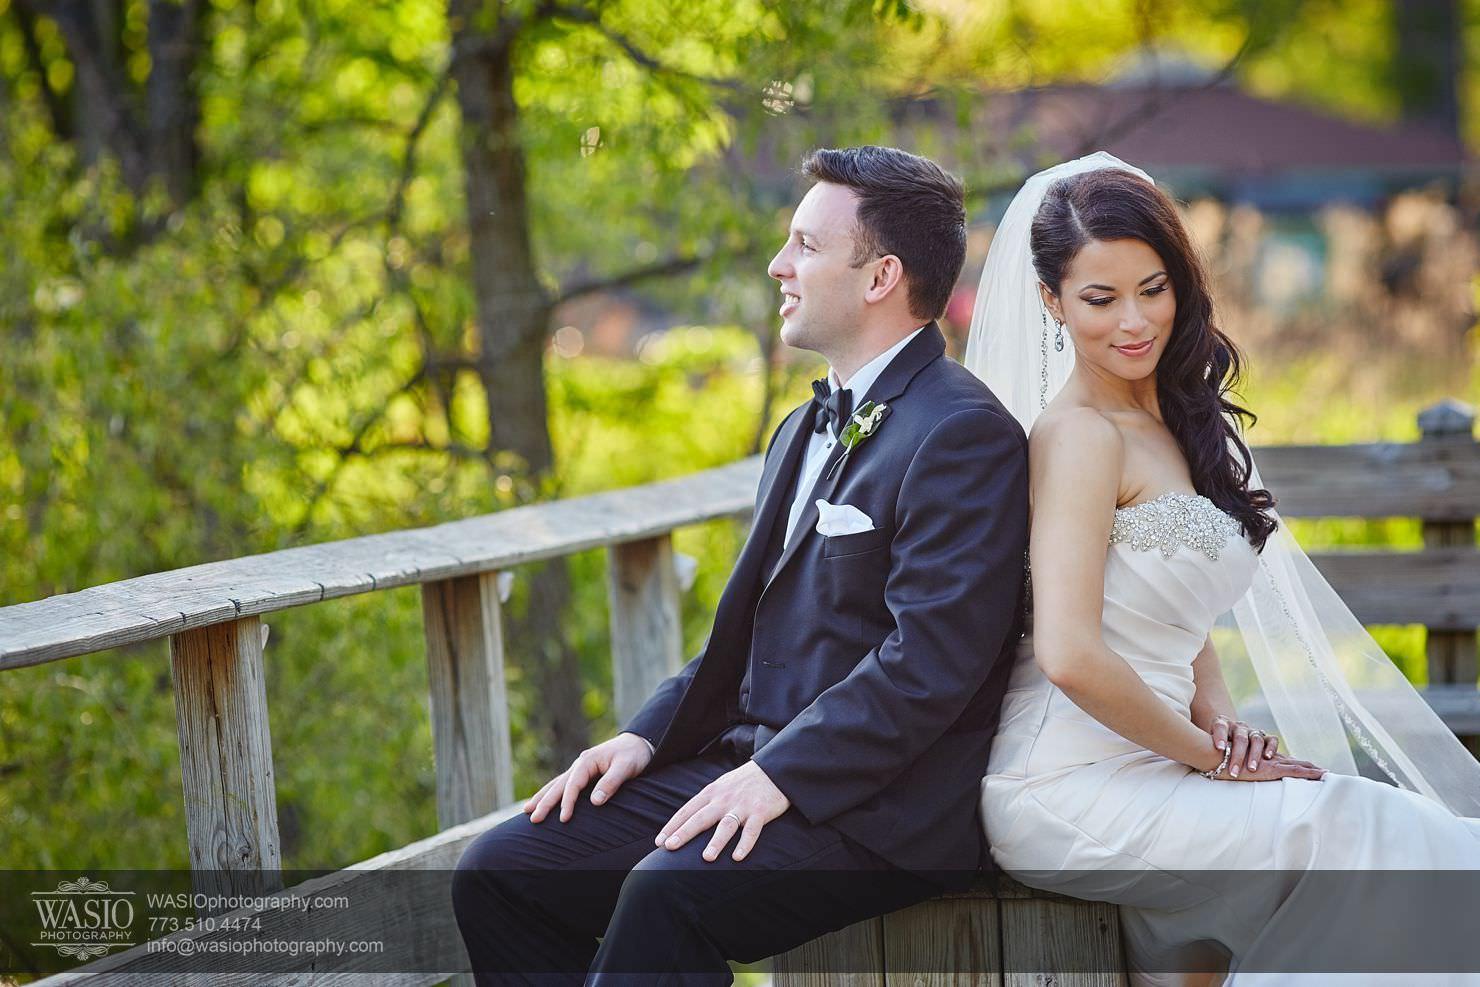 041_Chicago-Spring-Wedding_Chrissy-Andrew_3P4C6202 Chicago Spring Wedding - Chrissy + Andrew